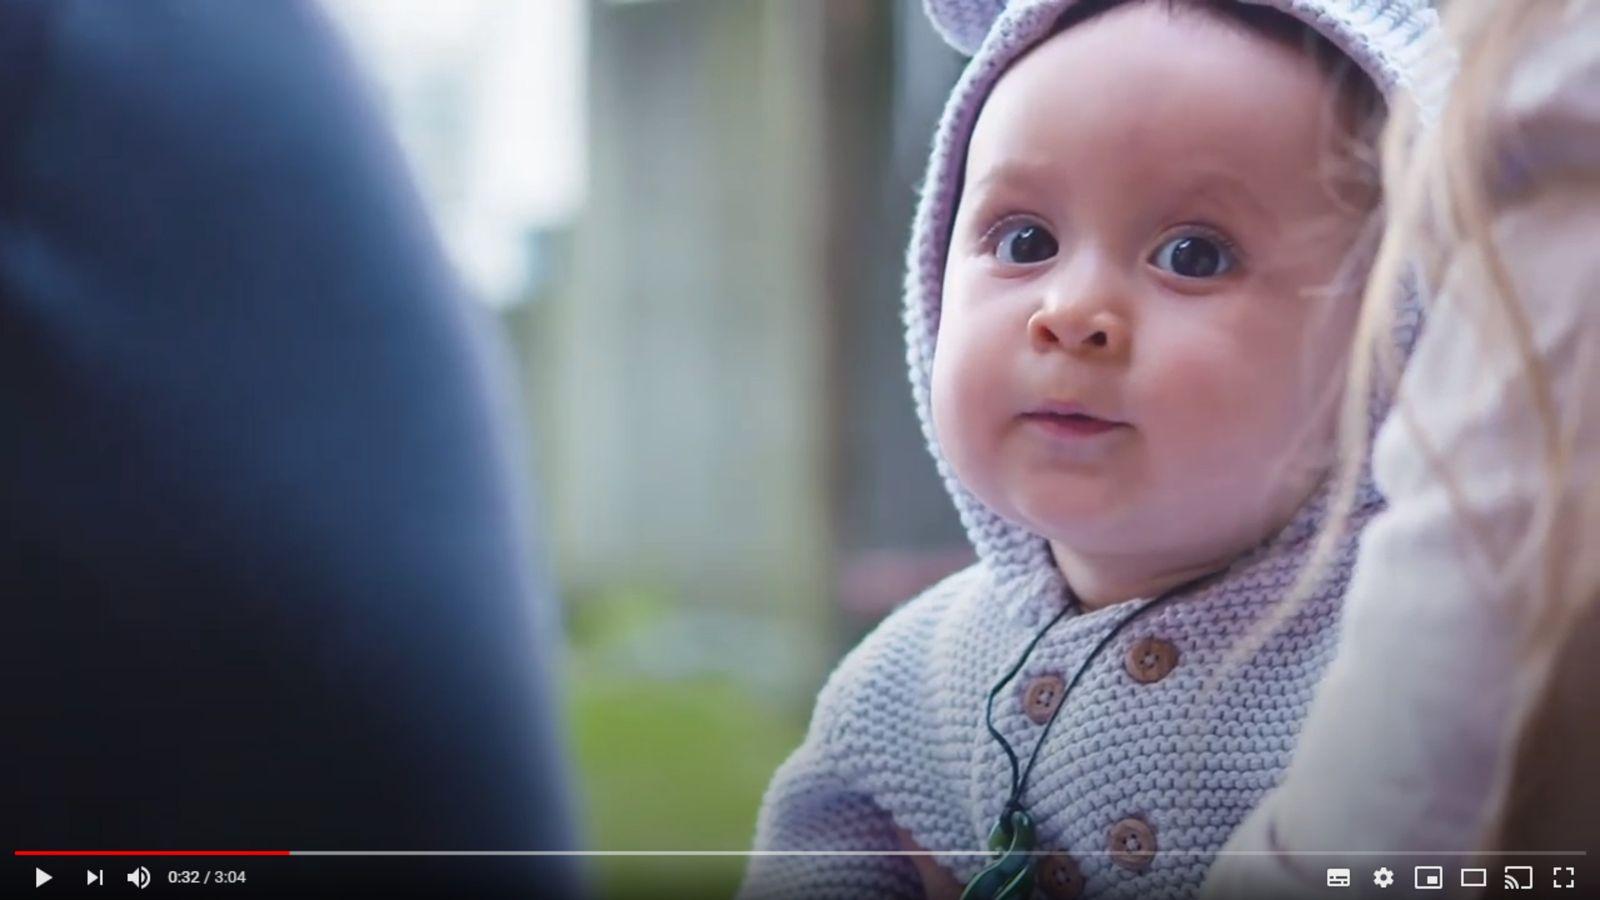 A baby looking at the camera